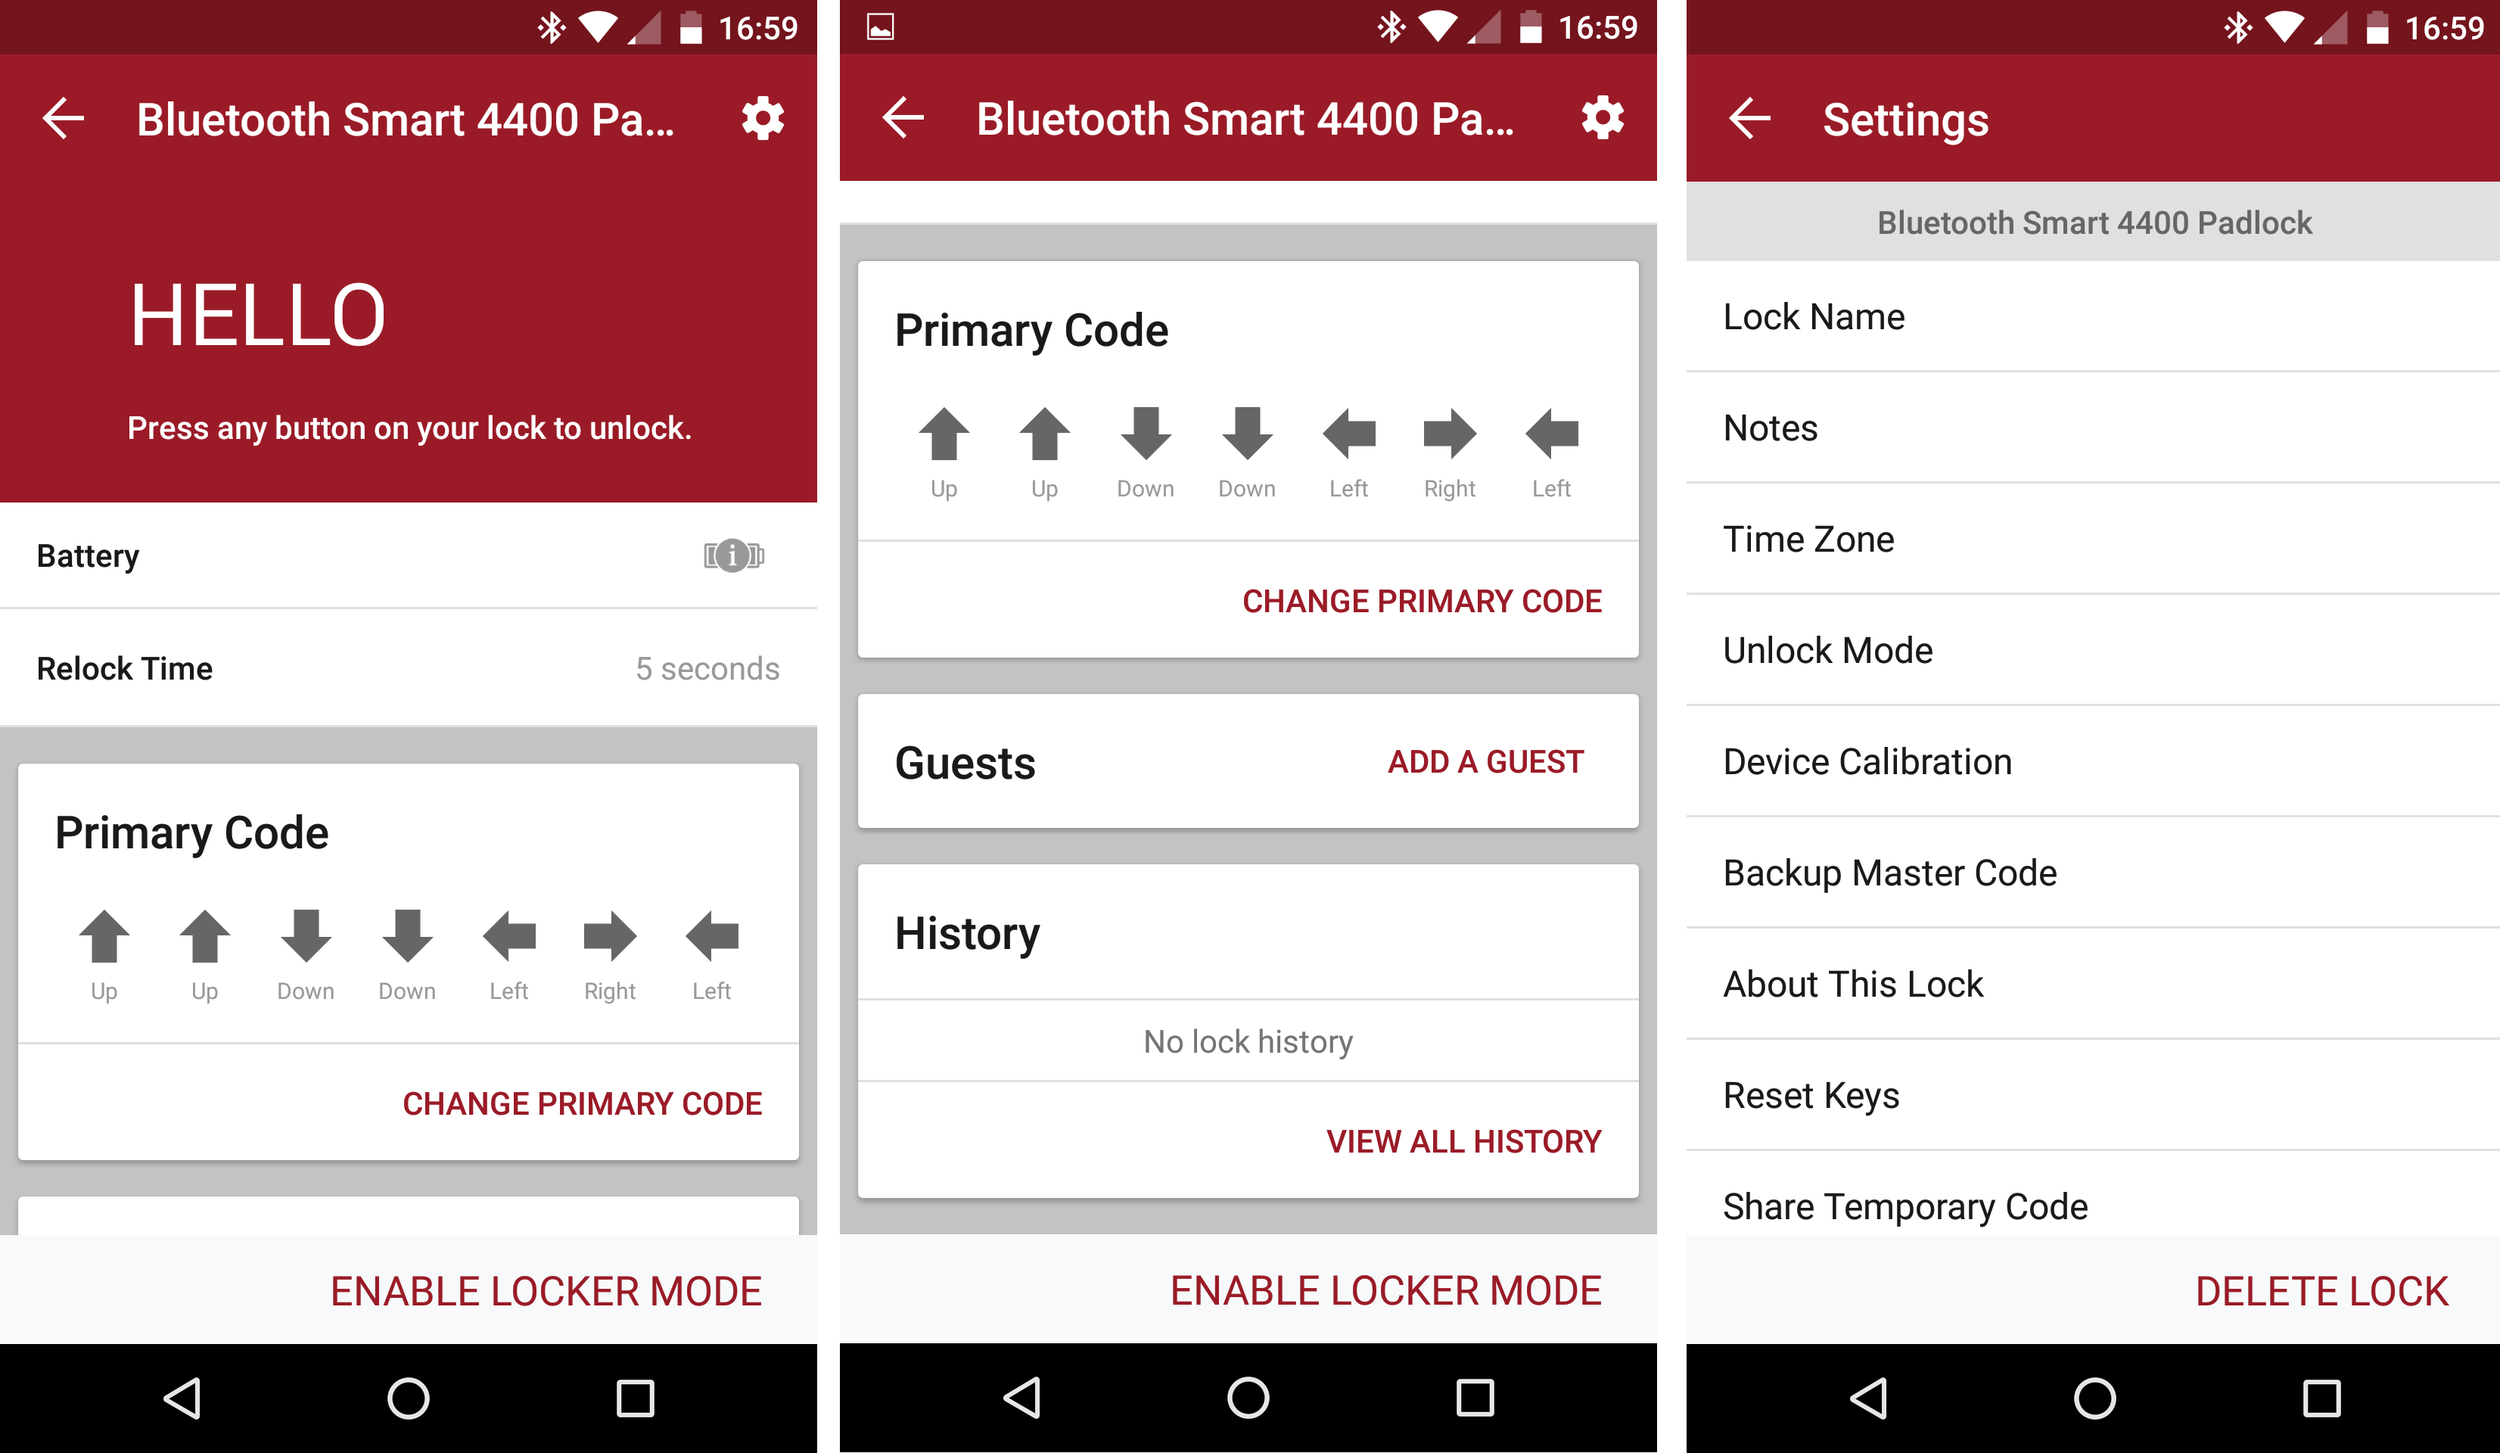 masterlock_bluetooth_smart_4400_padlock_android_ui_settings.png